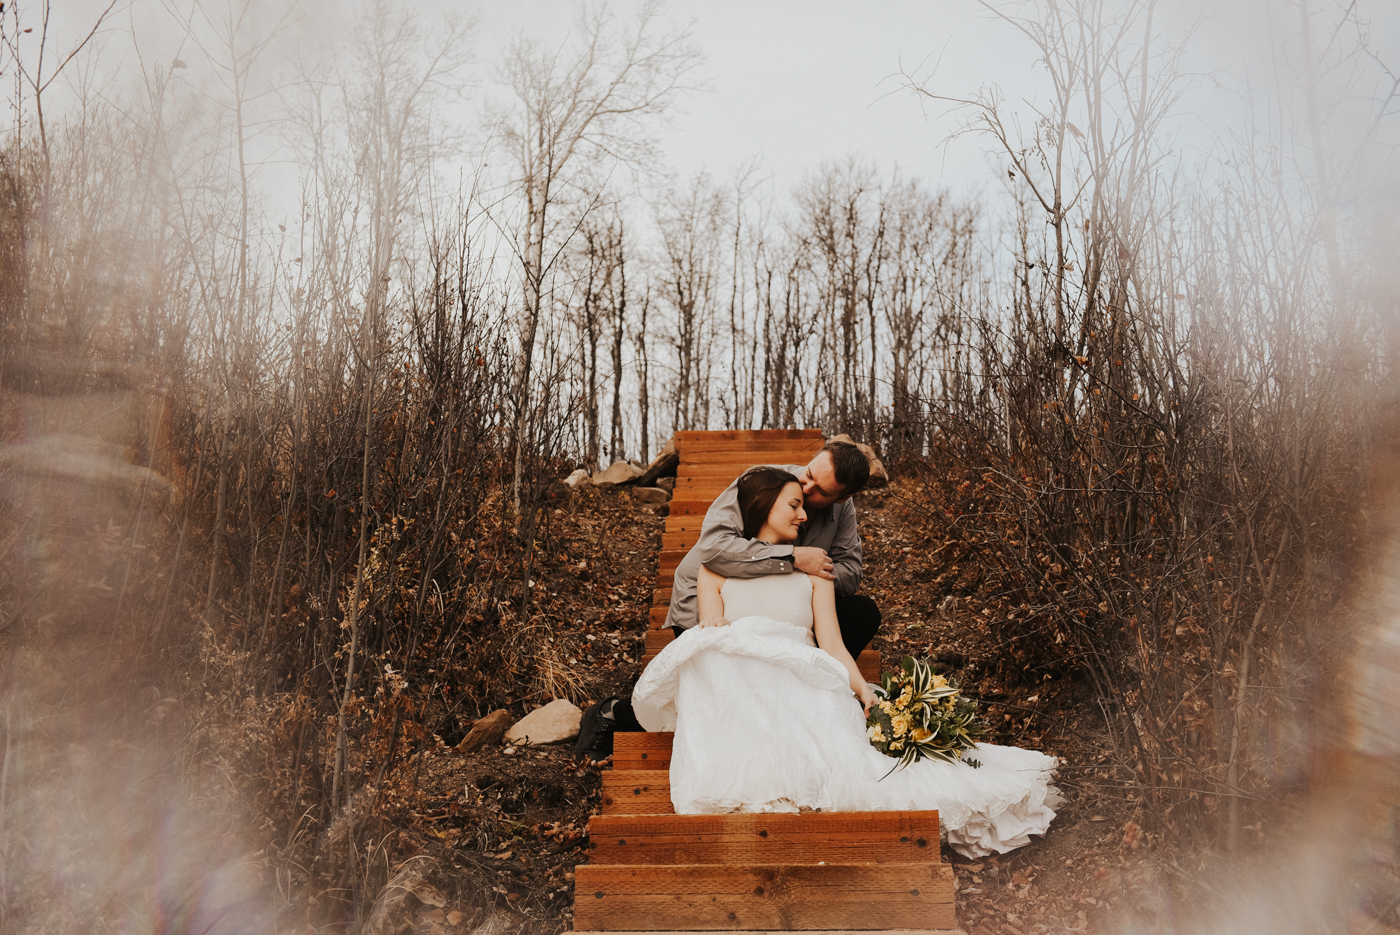 FortSt.John_photographer_TyraEPhotography_Wedding_Couple_Family_Photograhy_DawsonCreek_Elopement_Bride_Boduoir_Portraits-24.jpg